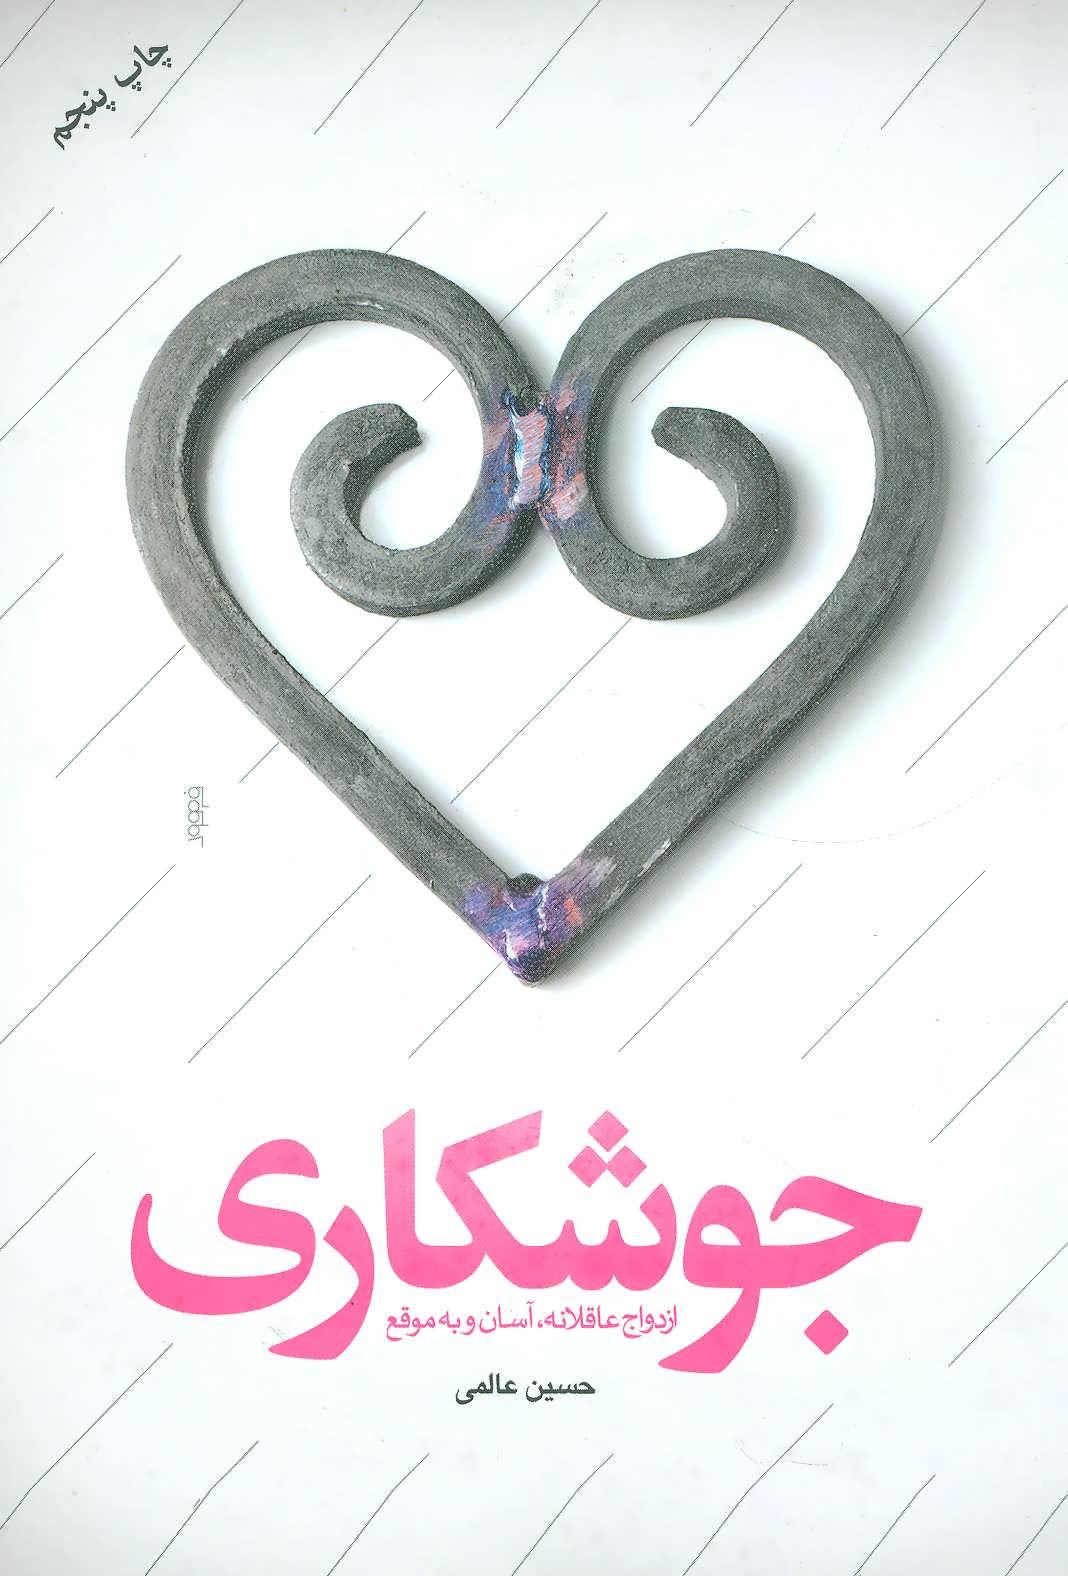 جوشكاري (ازدواج عاقلانه،آسان و به موقع)